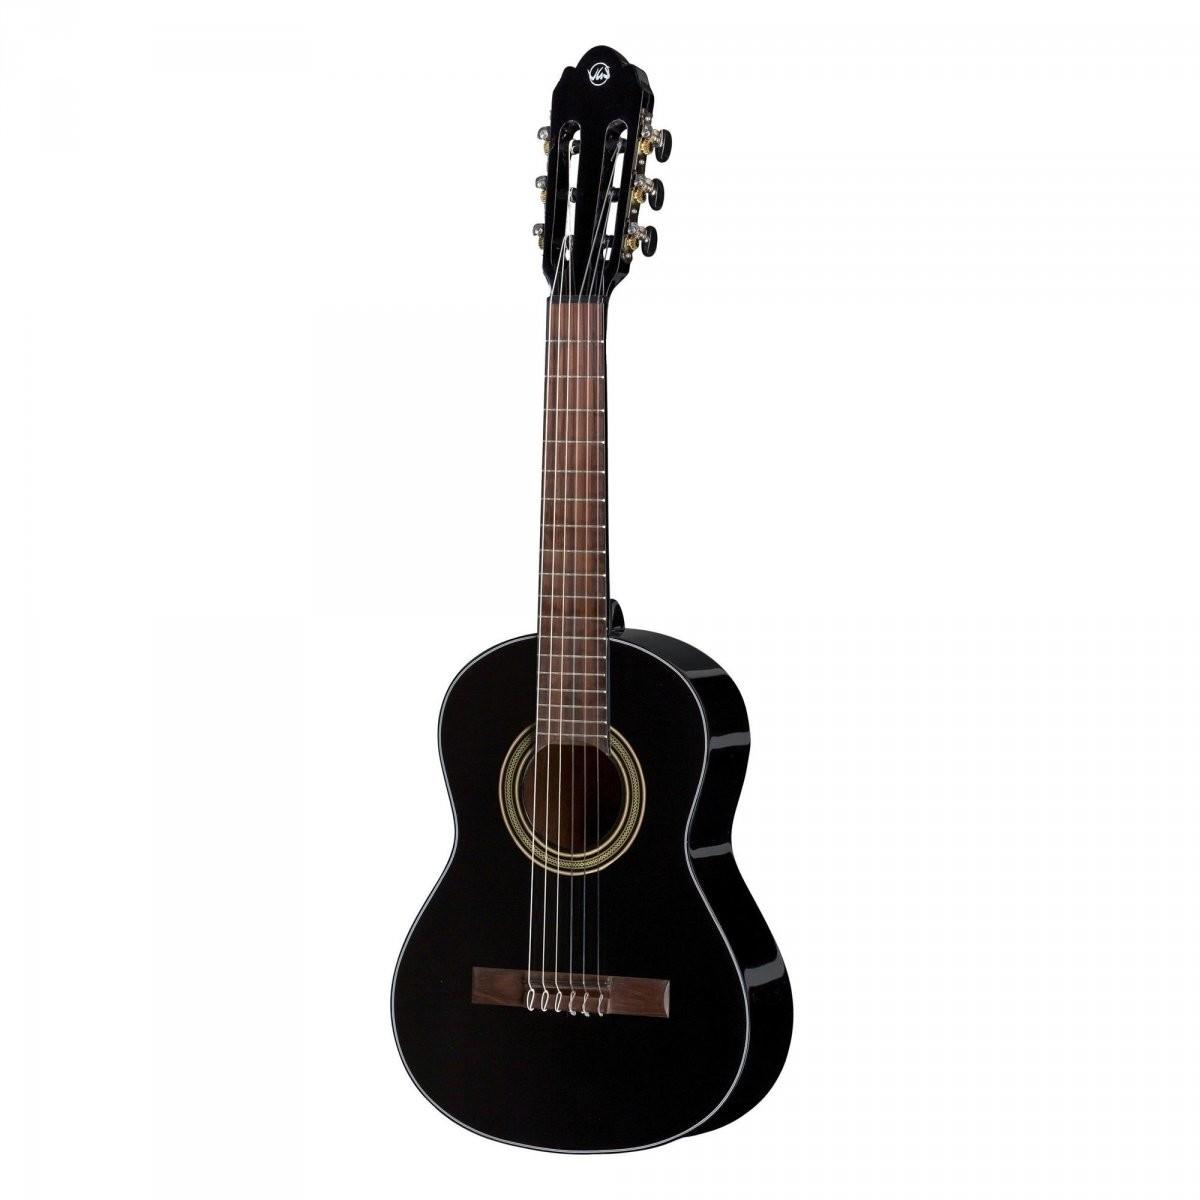 Gewa 500102 BL gitara klasyczna 1/4